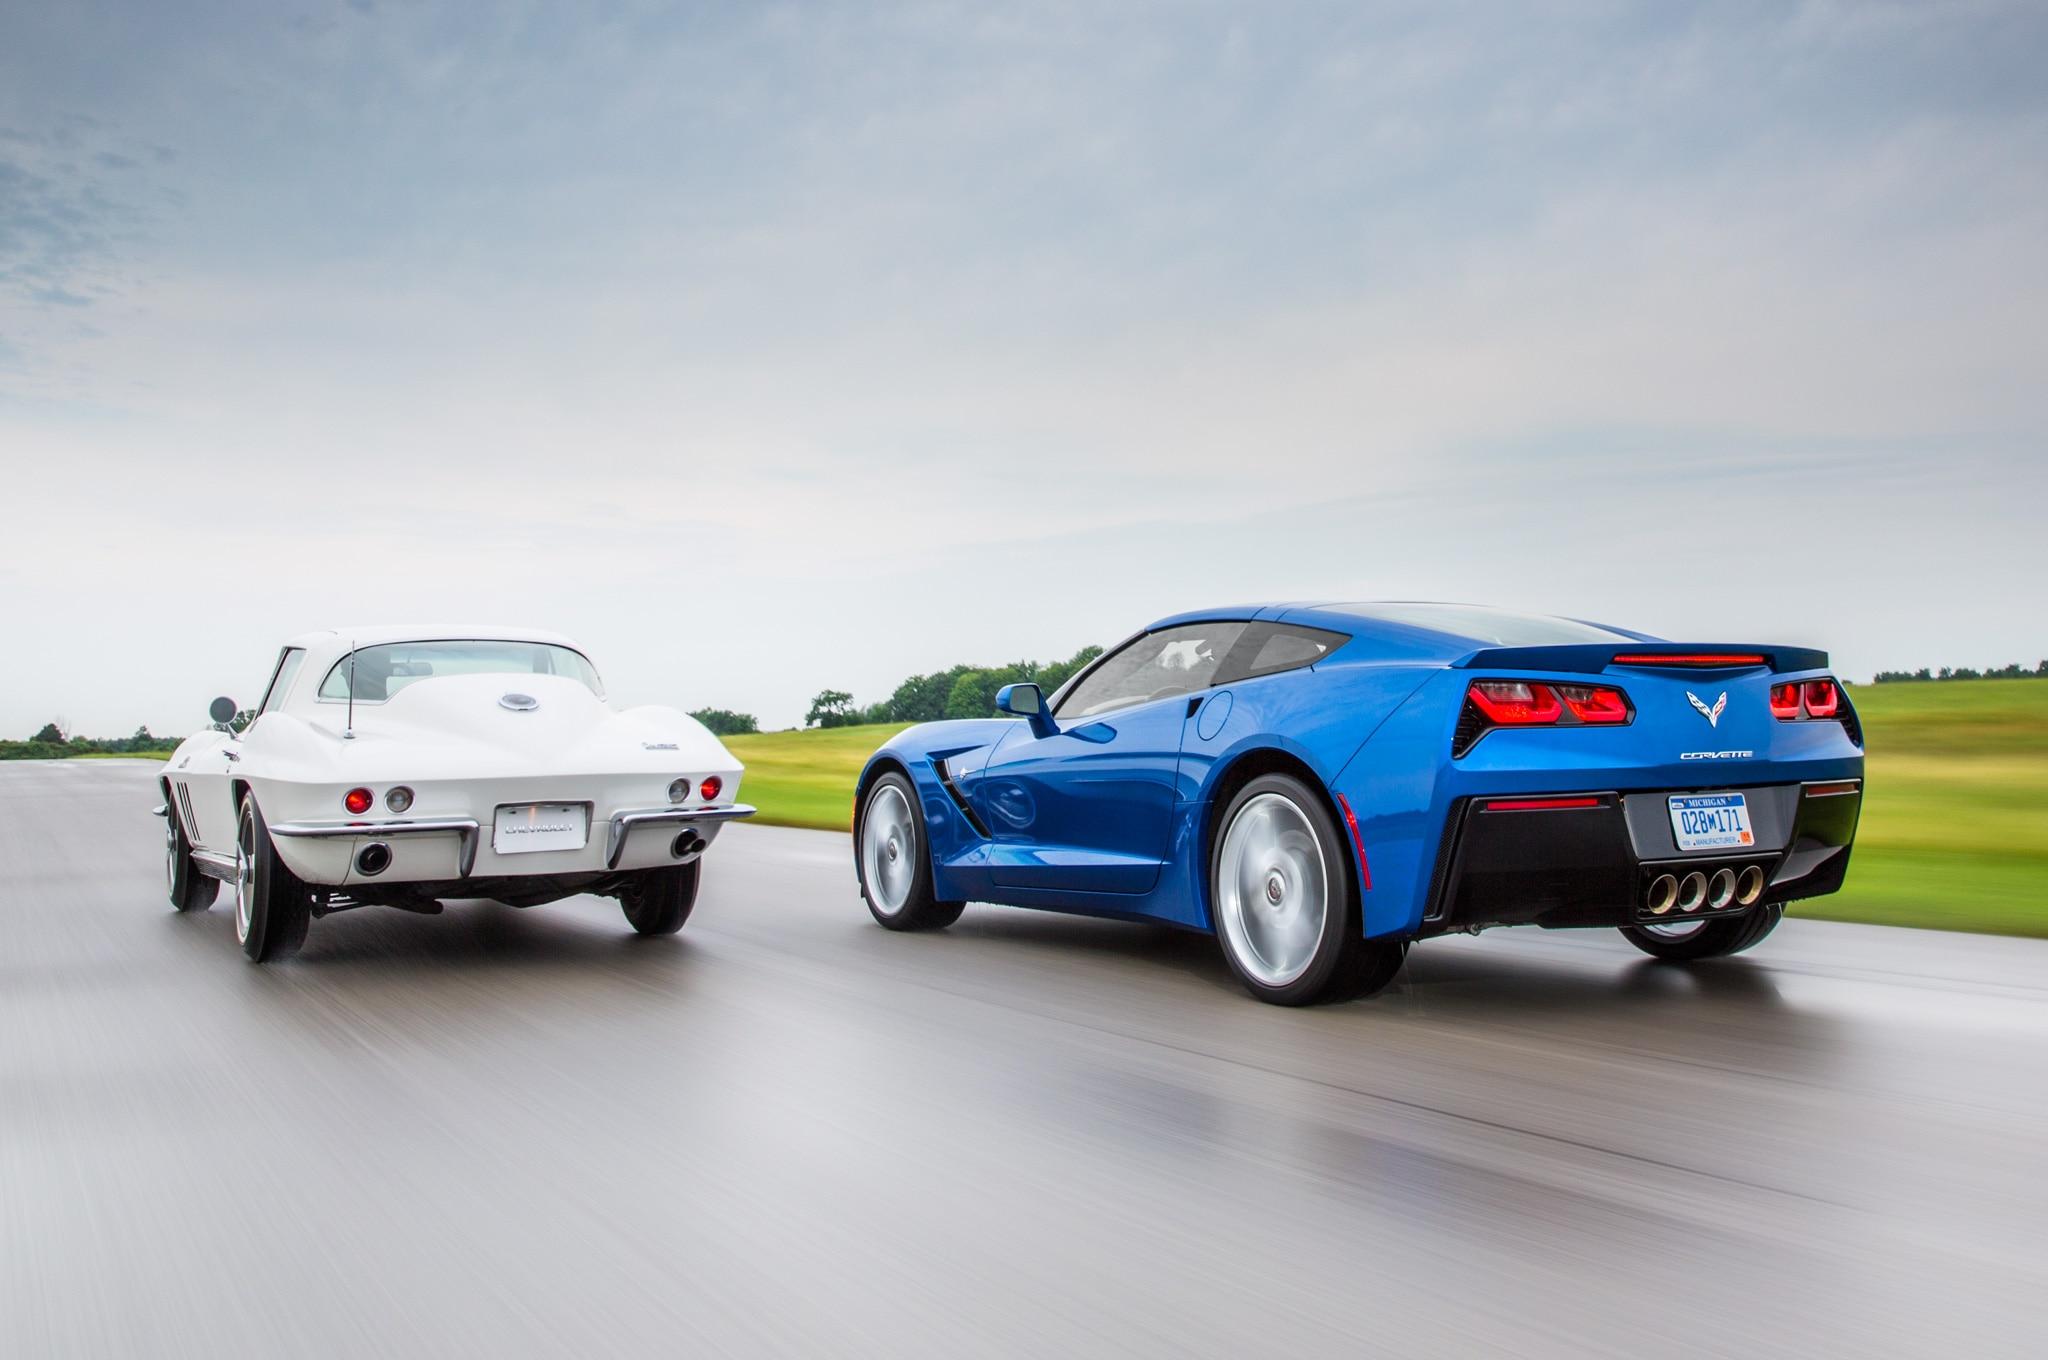 2014 Chevrolet Corvette Stingray First Drive - Automobile Magazine